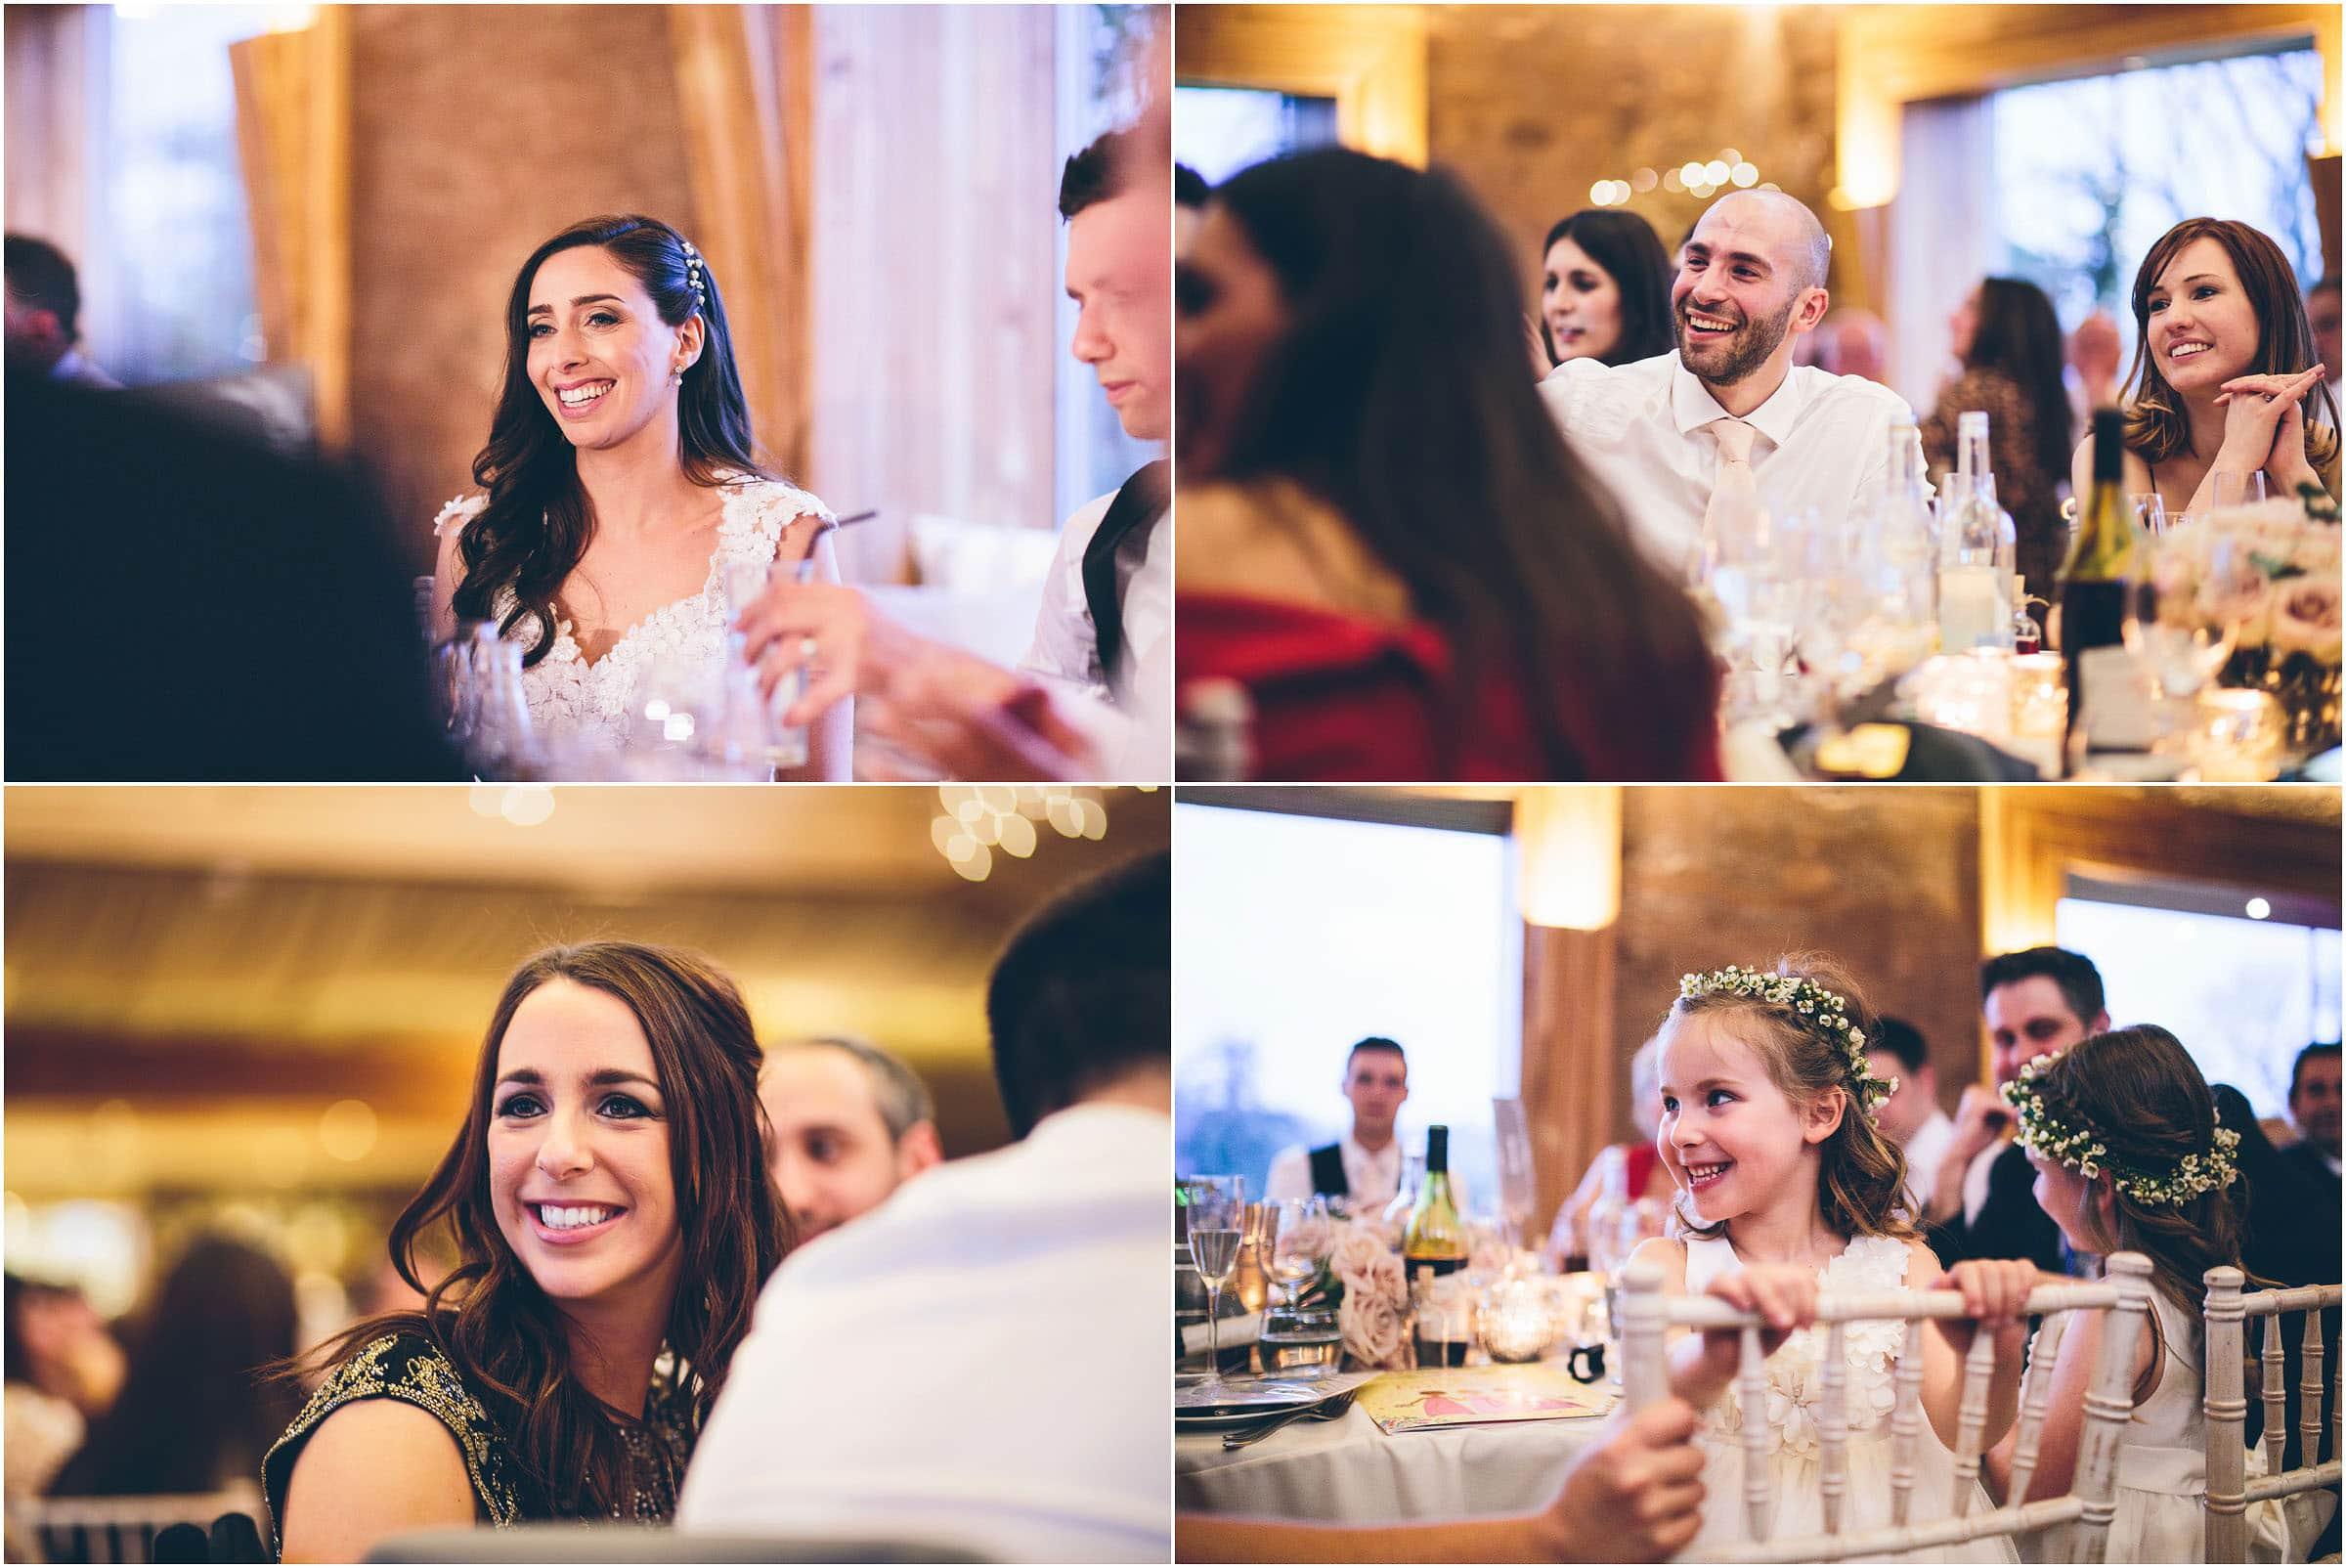 Elmore_Court_Wedding_Photography_0096